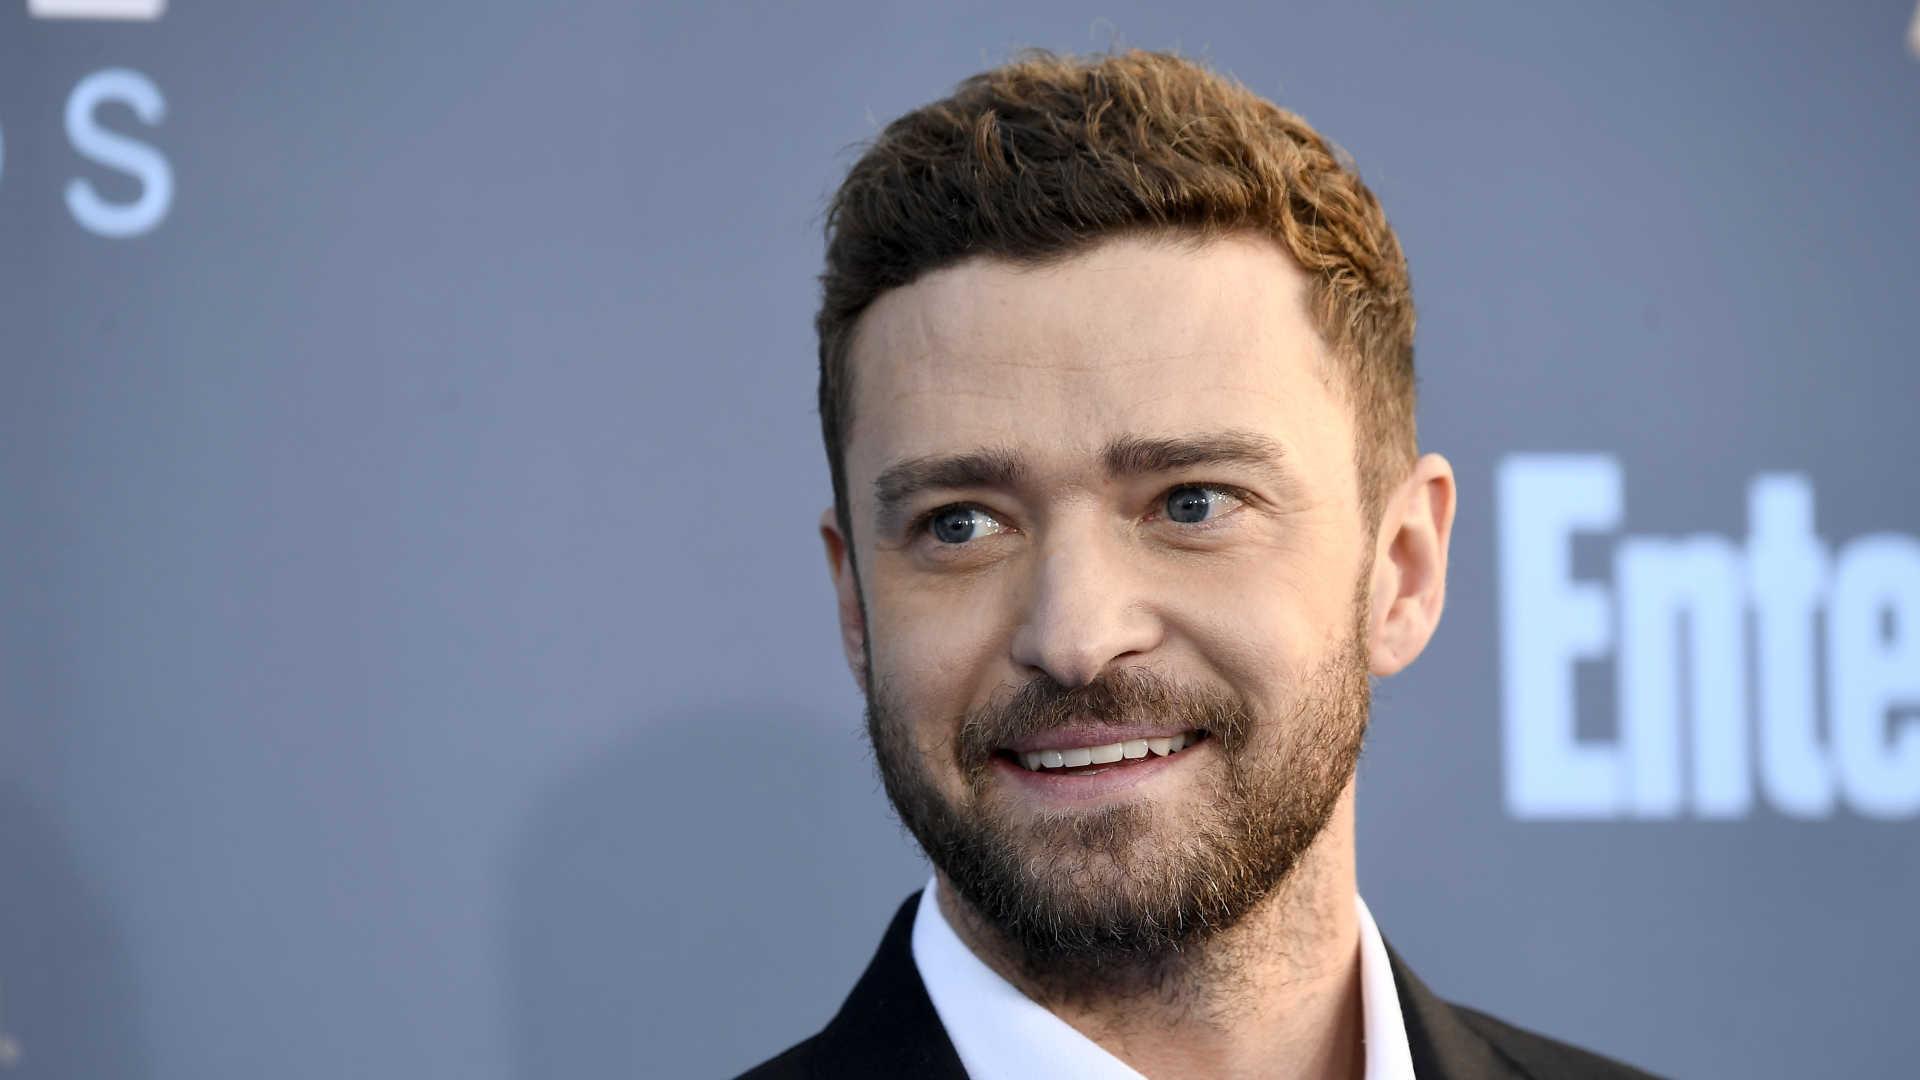 Justin Timberlake anuncia datas de regresso aos palcos